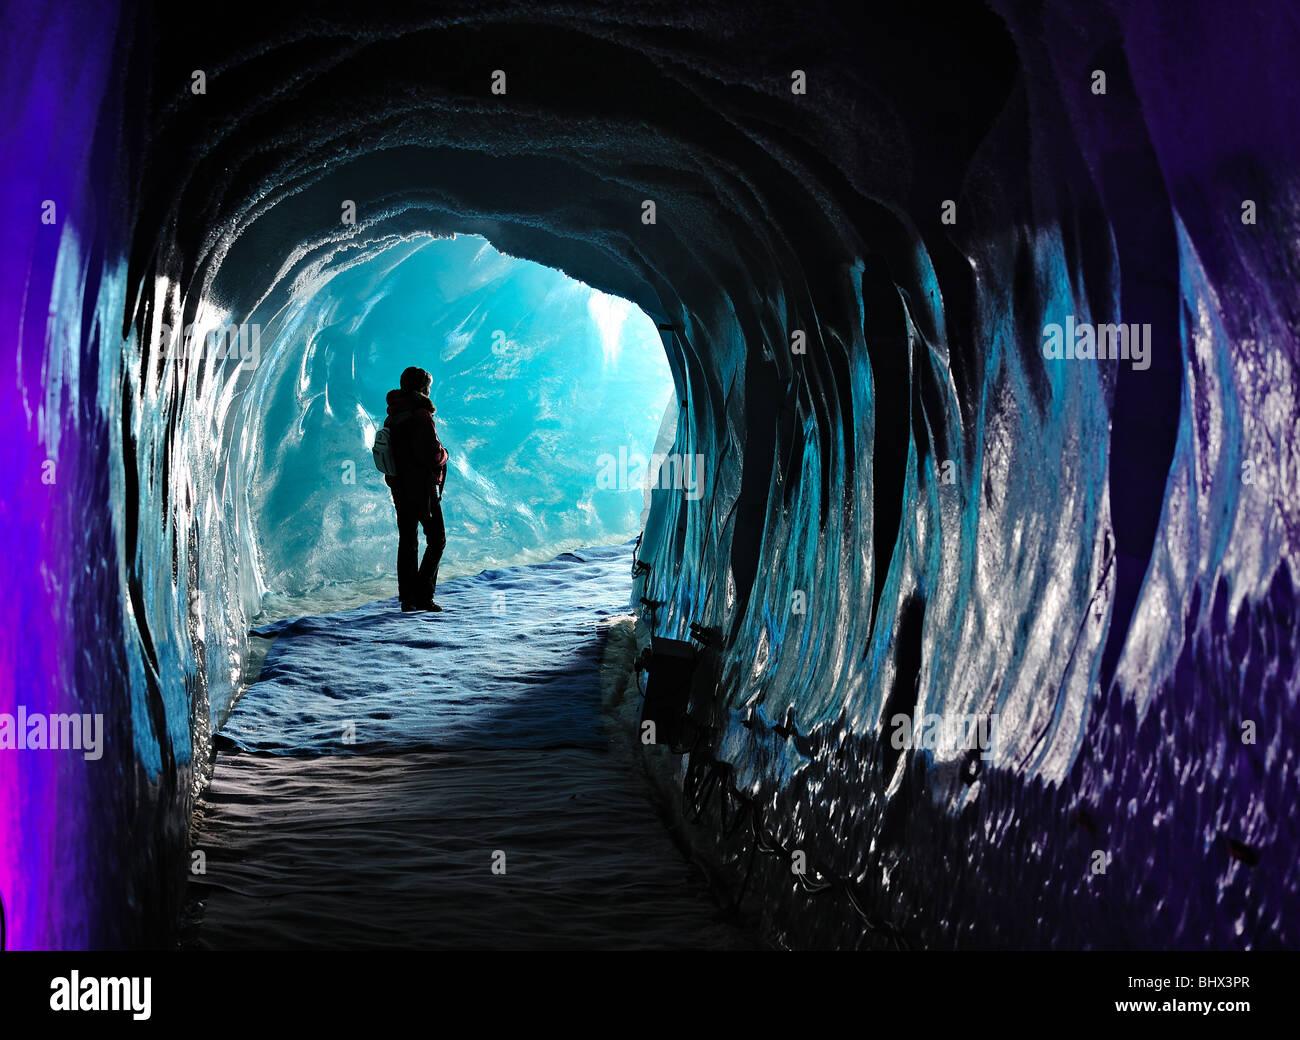 Grotte de Glace, French Alps, Chamonix. - Stock Image